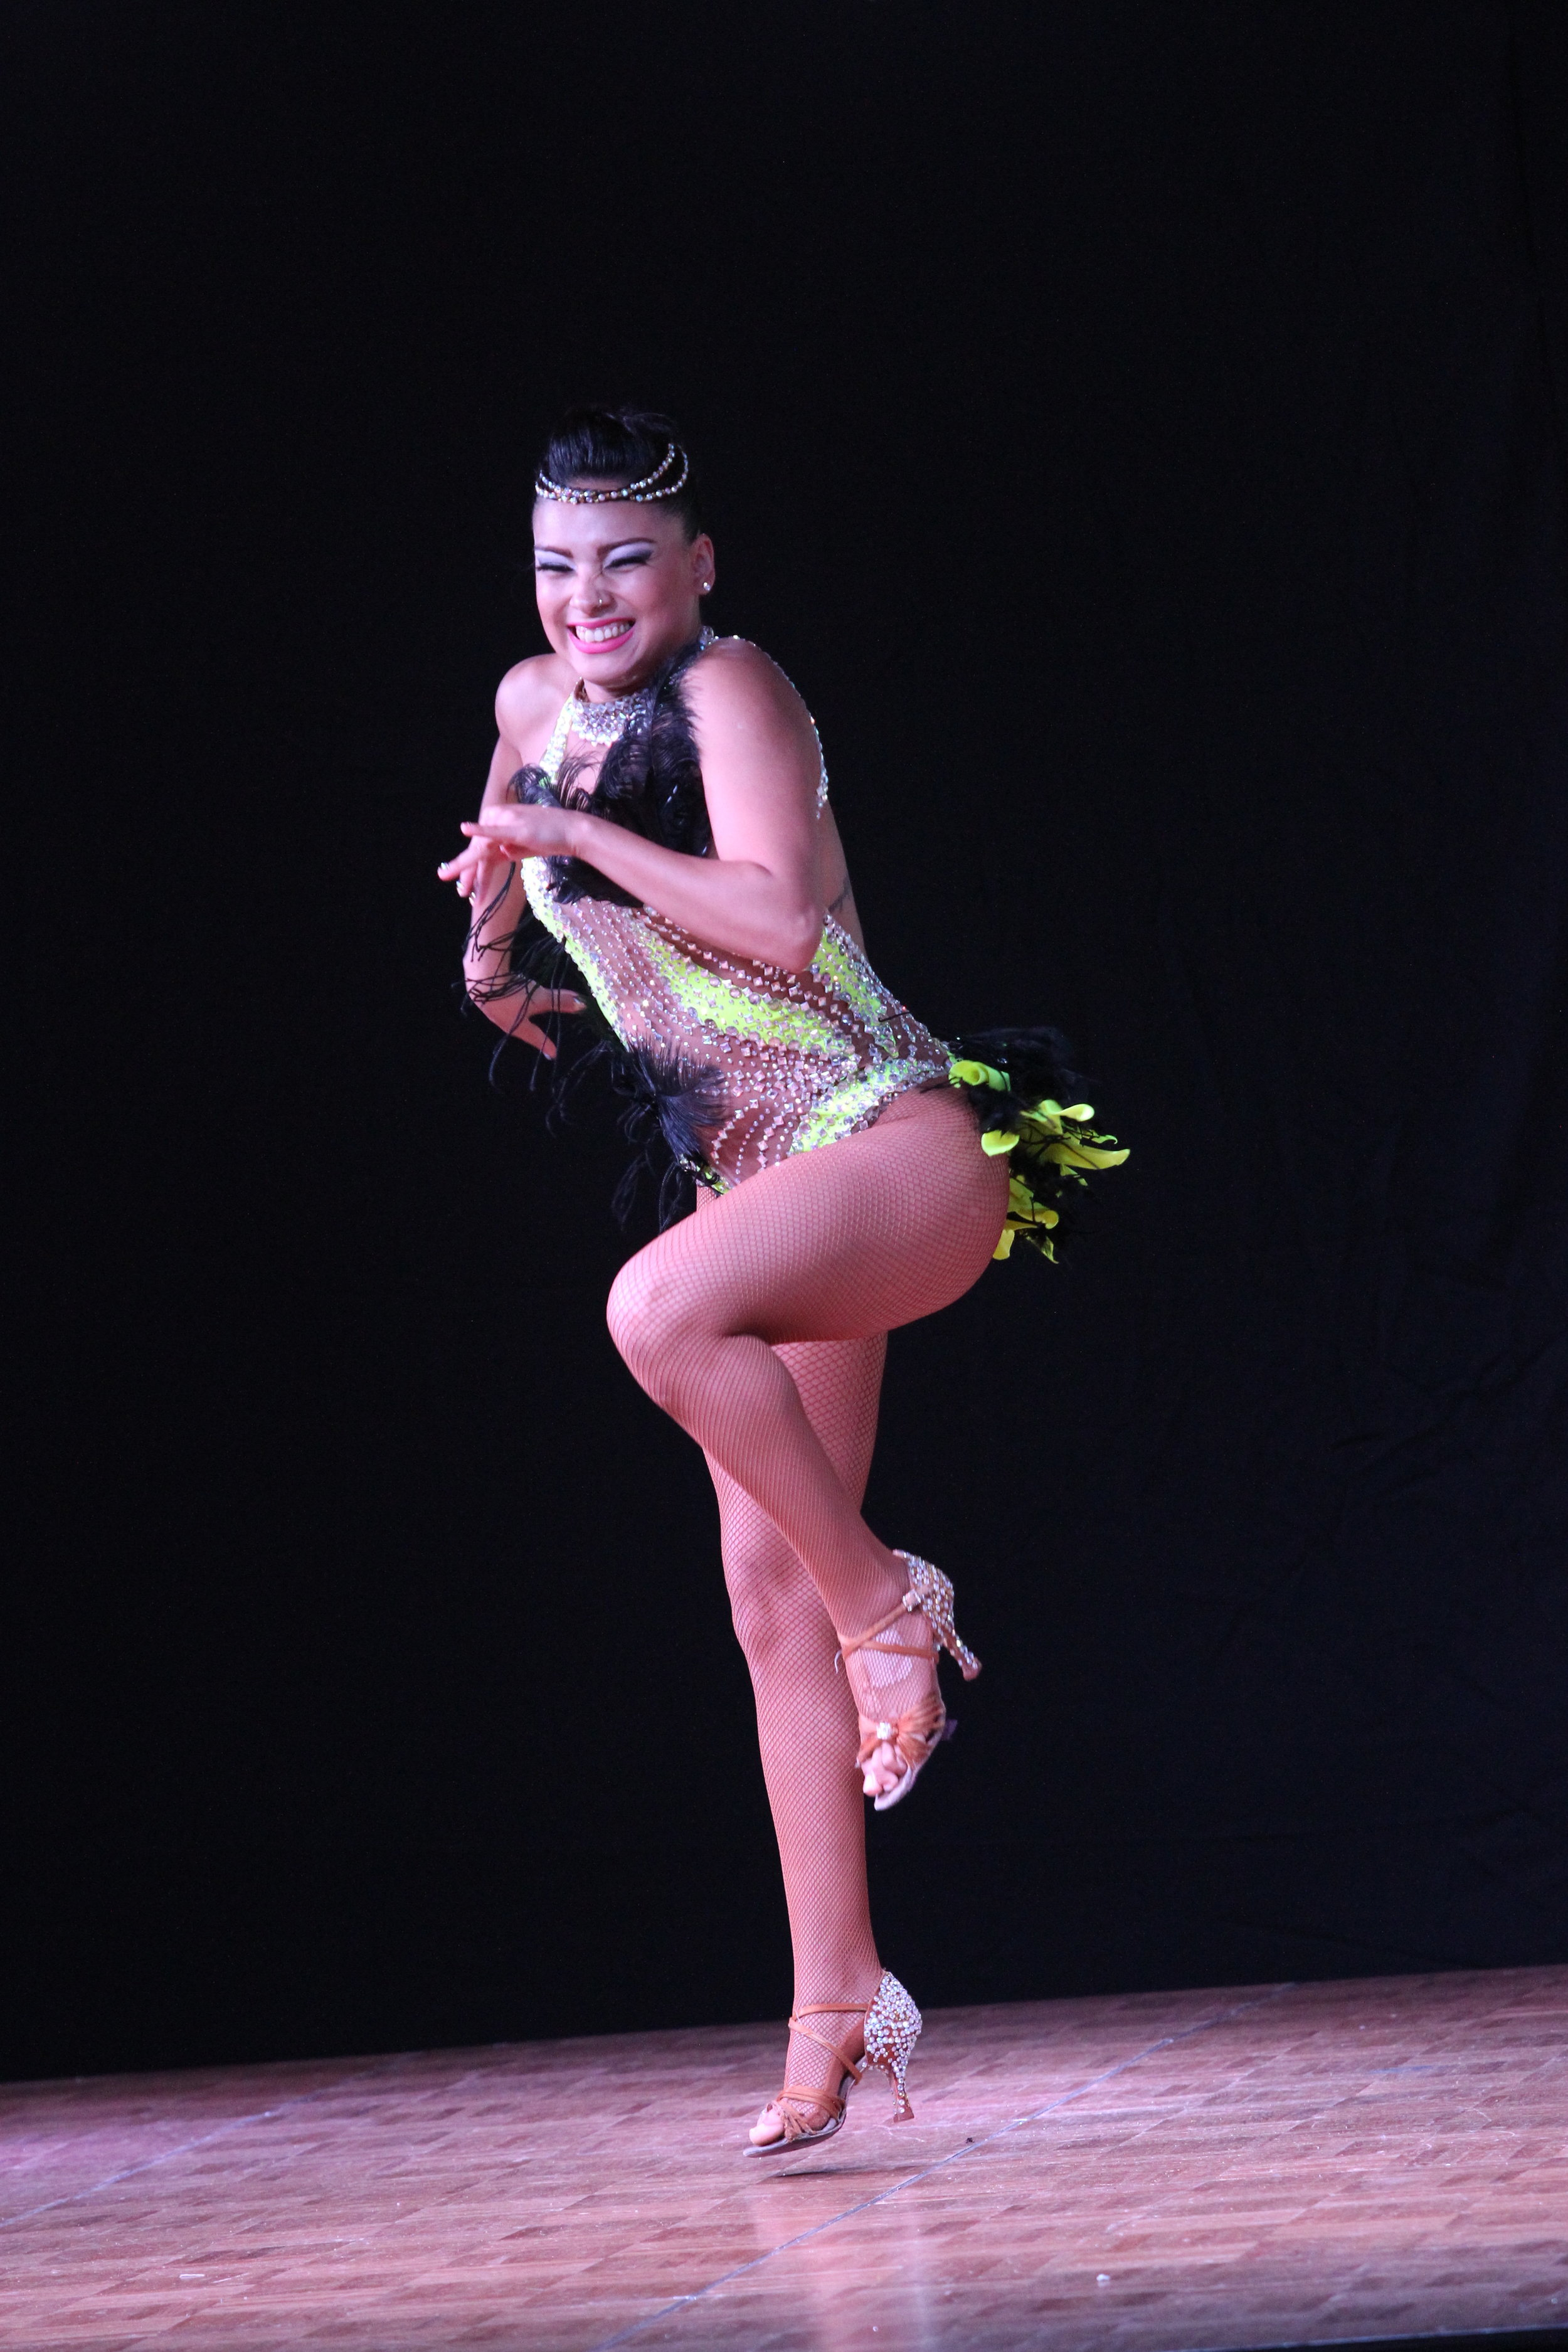 Paula Fleites Argentina Foto #2.JPG